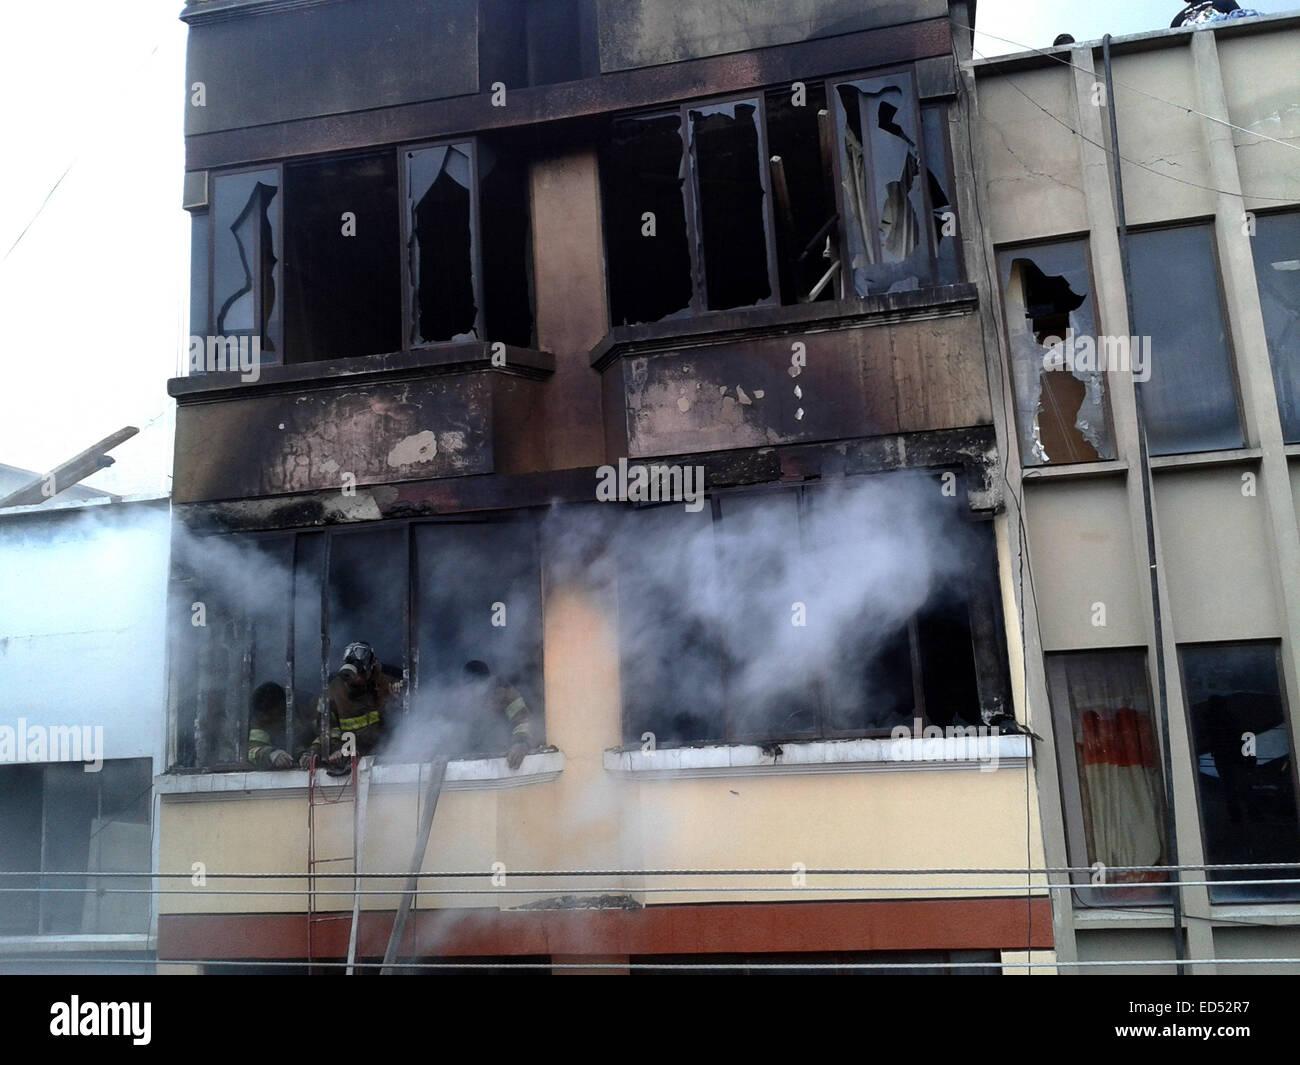 La Paz. 27th Dec, 2014. Photo taken on Dec. 27, 2014 shows the facade of a building caught on fire in La Paz, Bolivia. - Stock Image